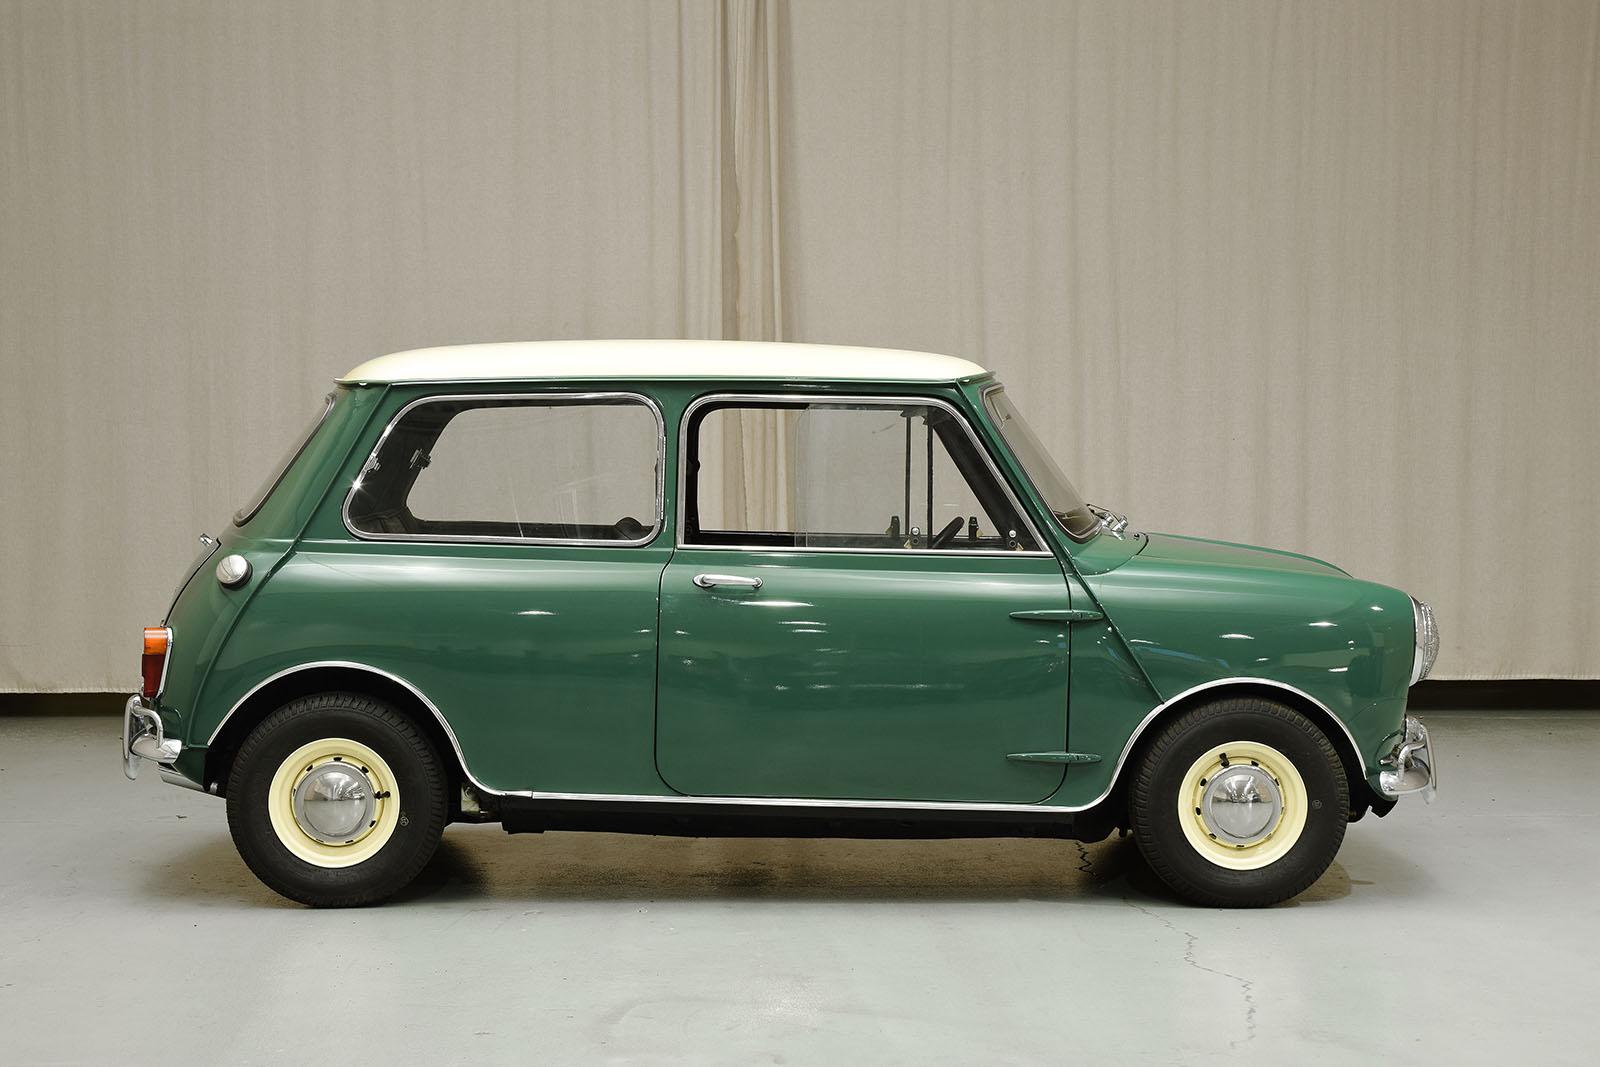 1967 austin mini cooper s coupe hyman ltd classic cars. Black Bedroom Furniture Sets. Home Design Ideas